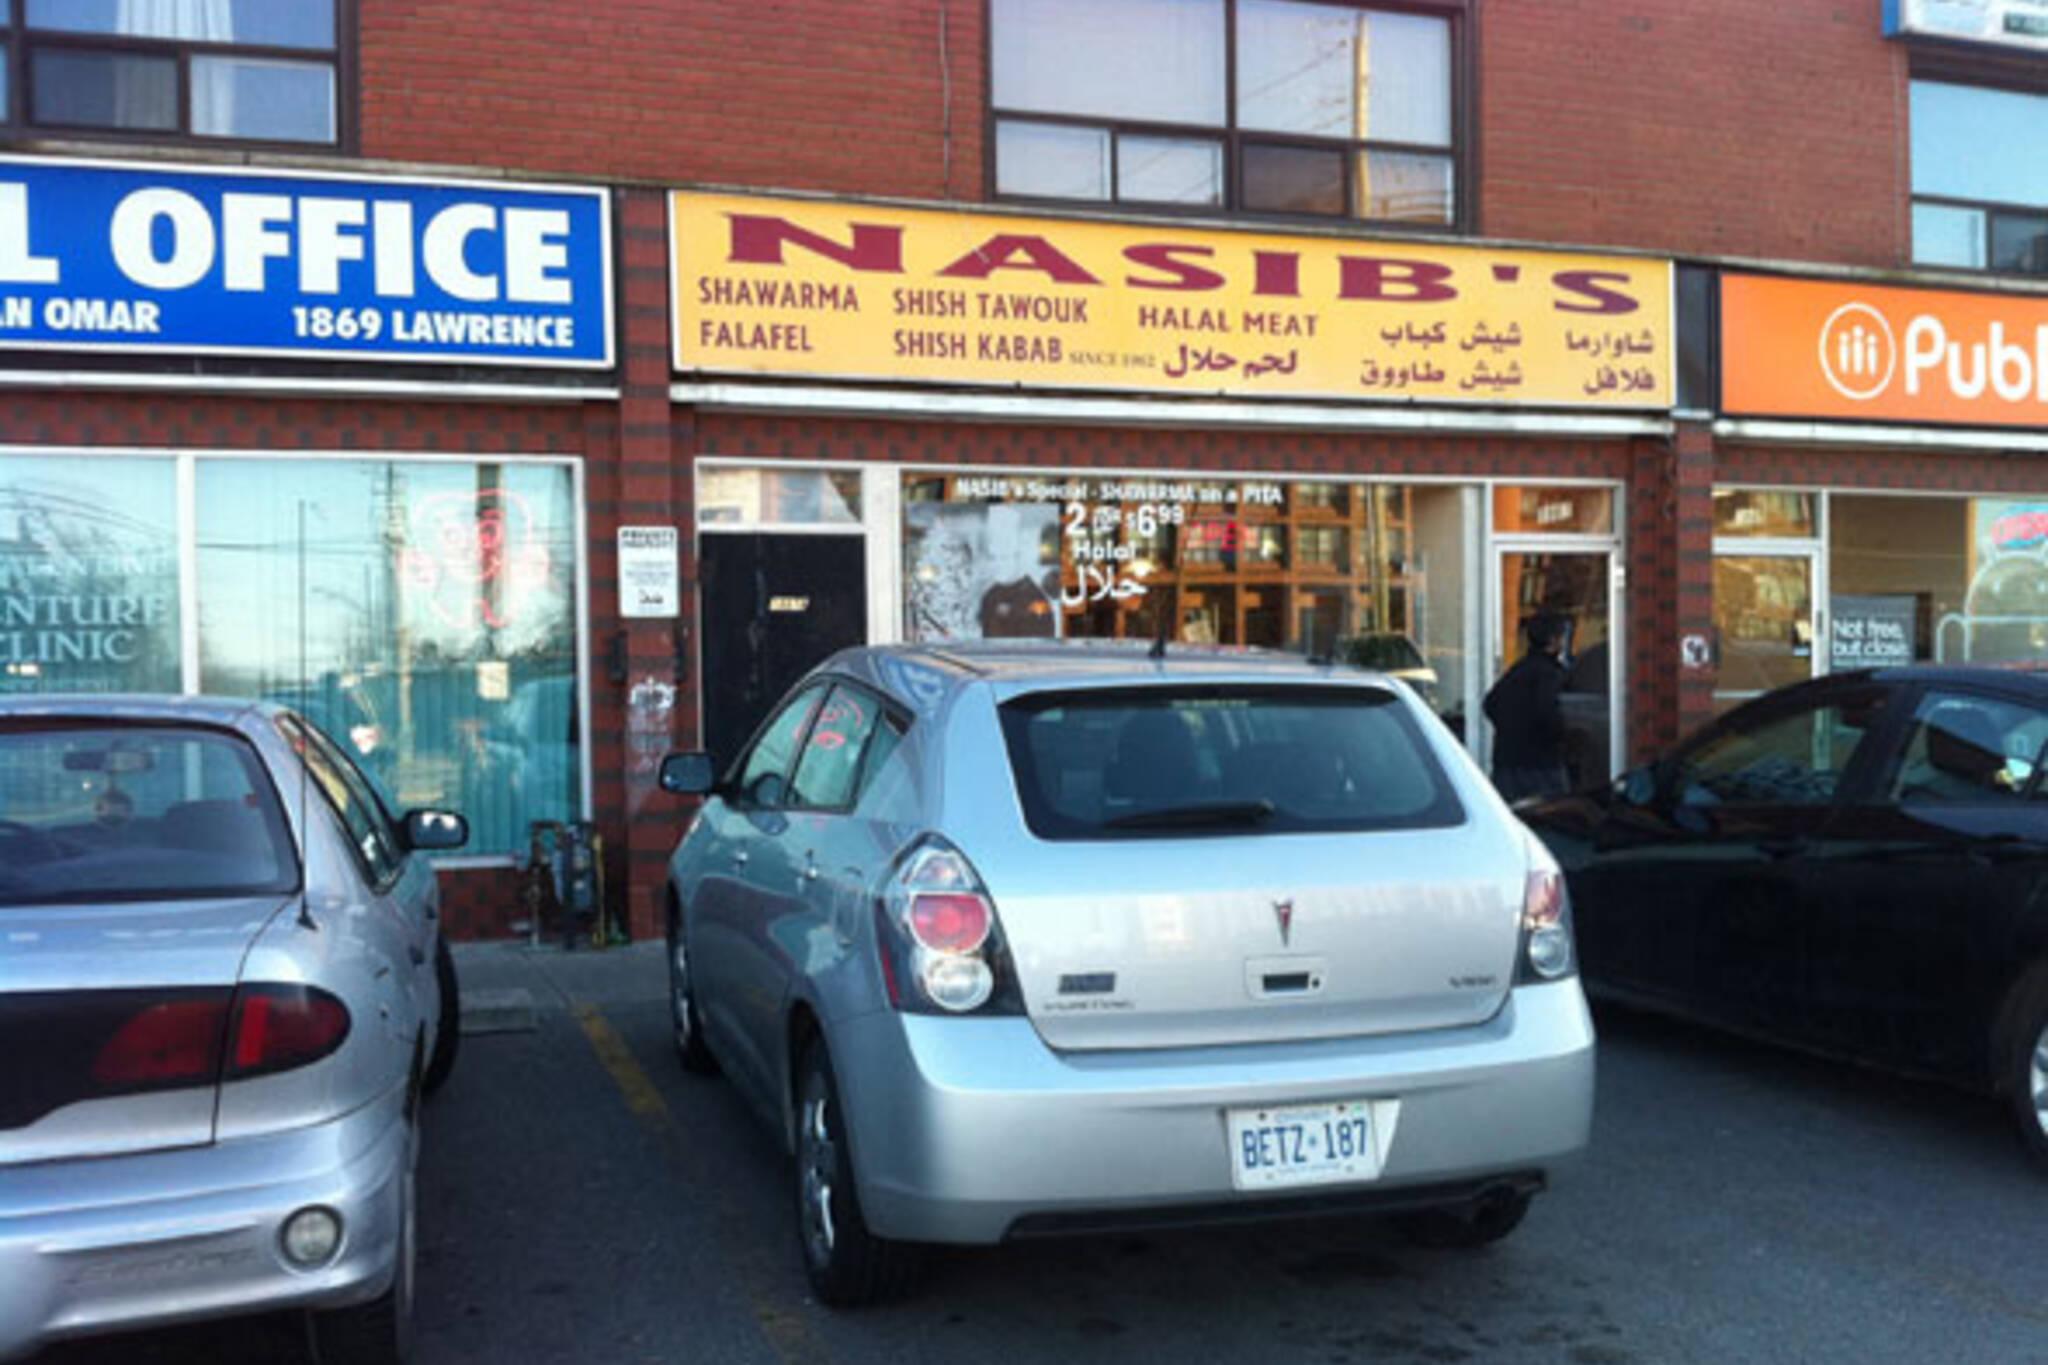 Nasib's Scarborough